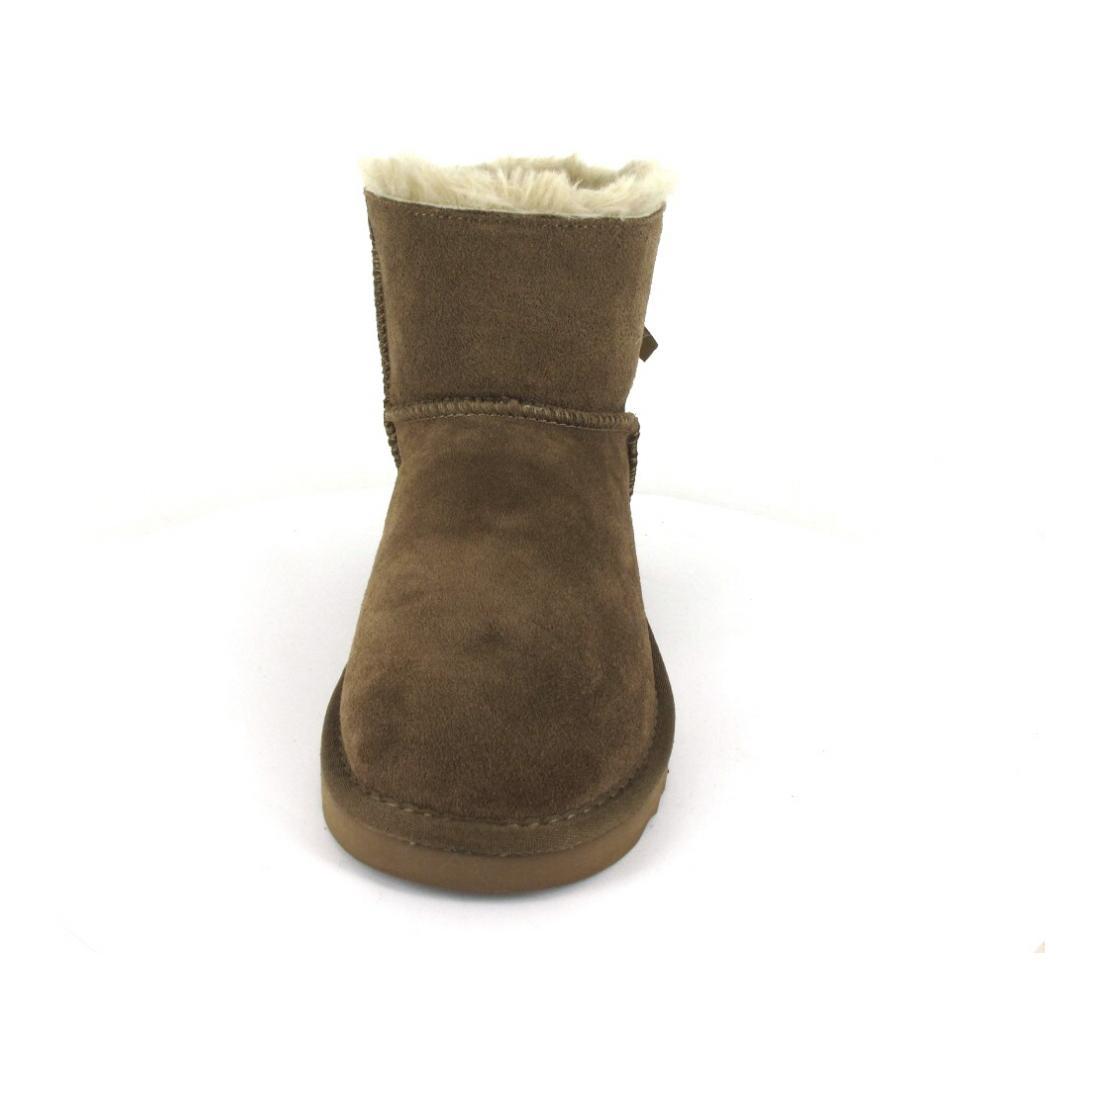 OOG Boots